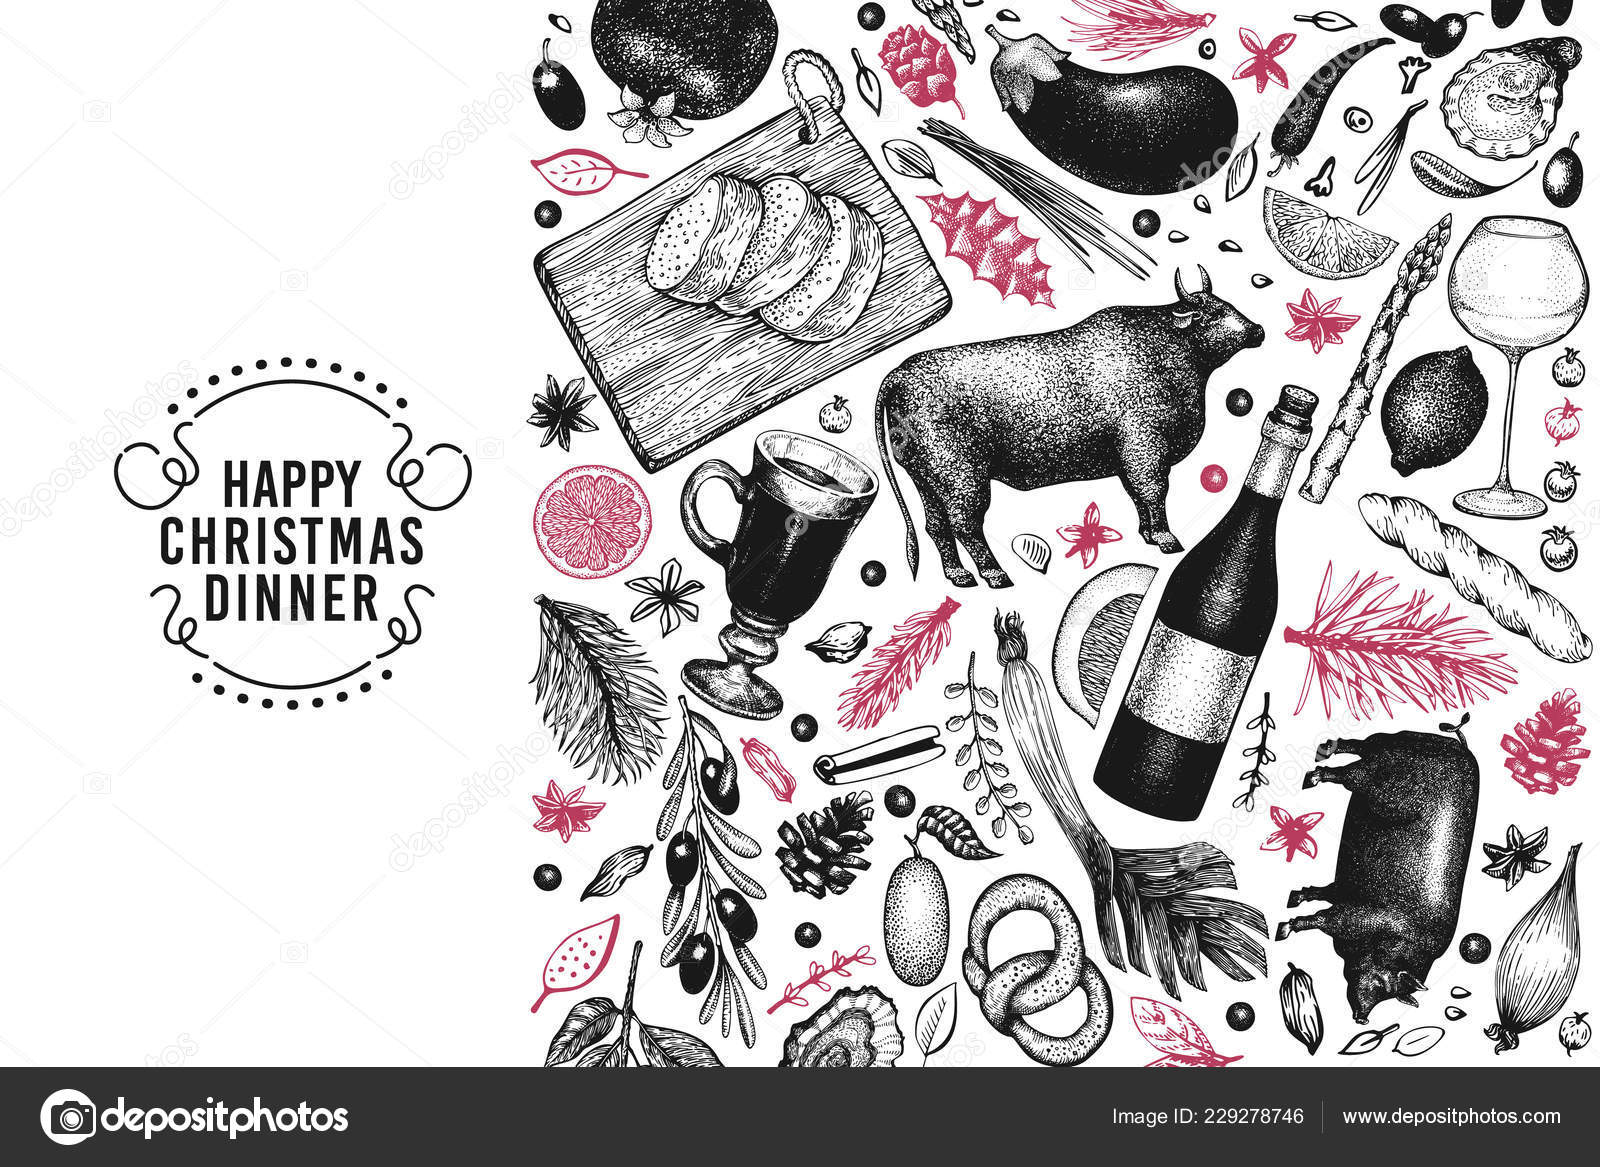 Happy Christmas Dinner Design Template Vector Hand Drawn